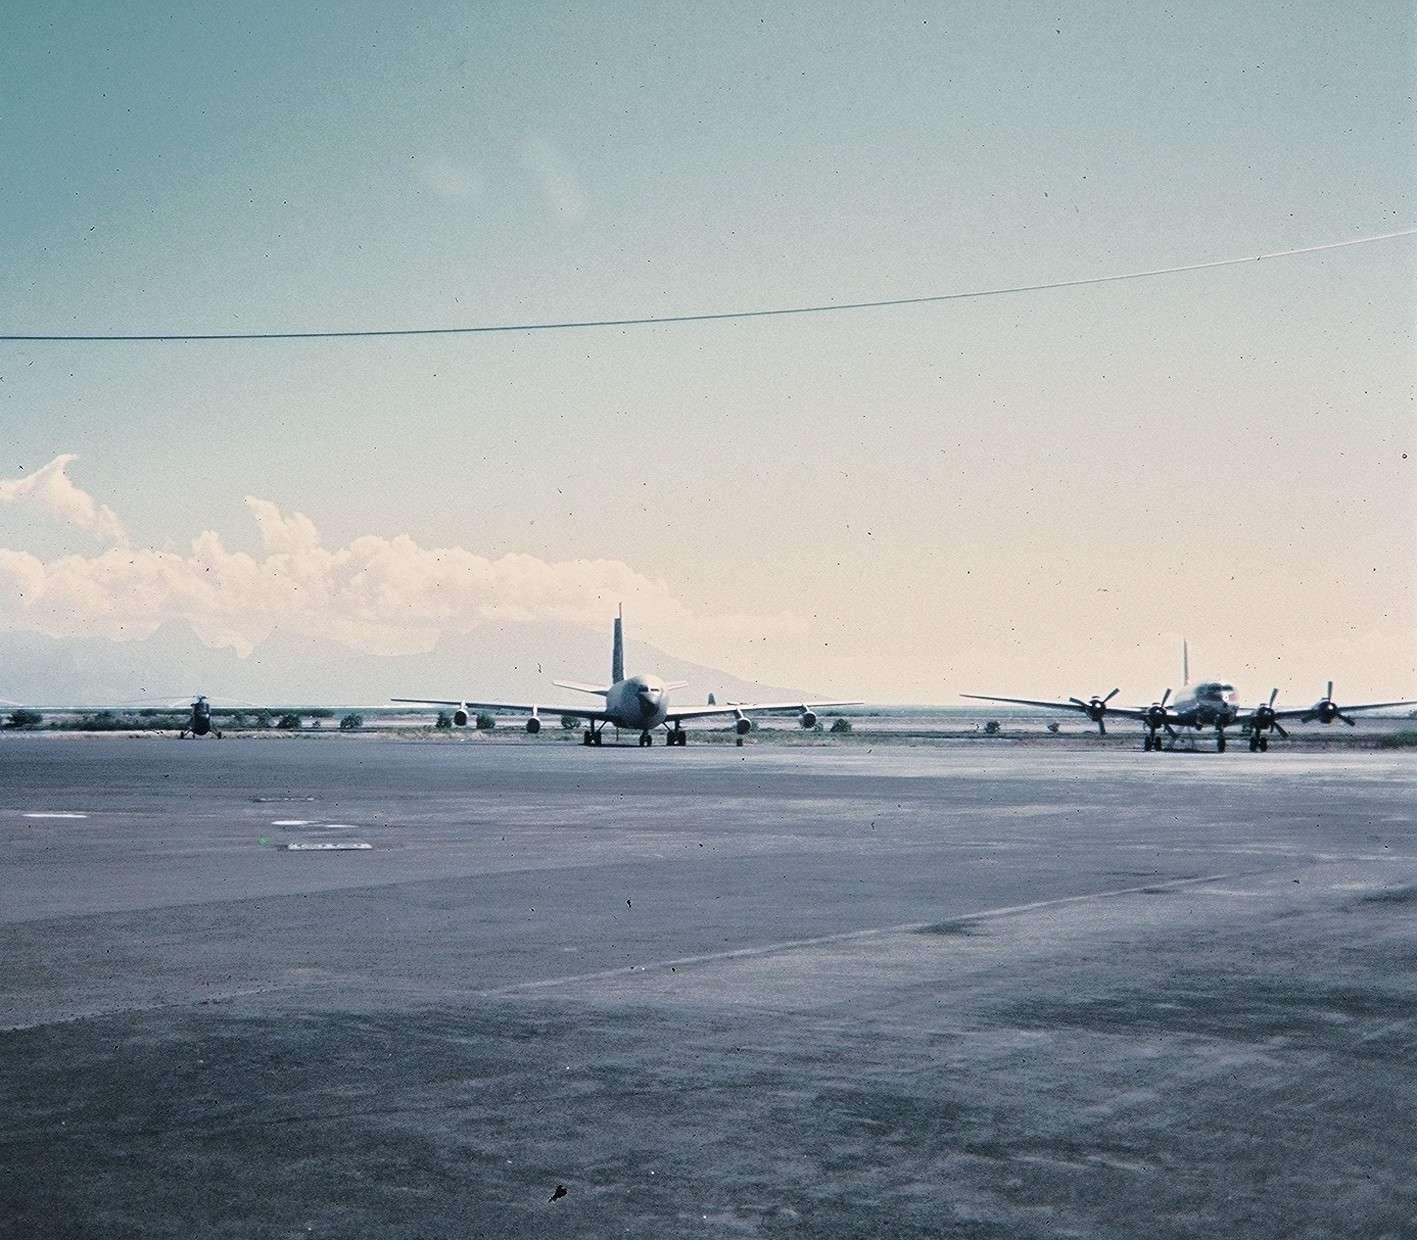 Tahiti] Aéroport Faa'a  durant les campagnes. Cd2_pa29